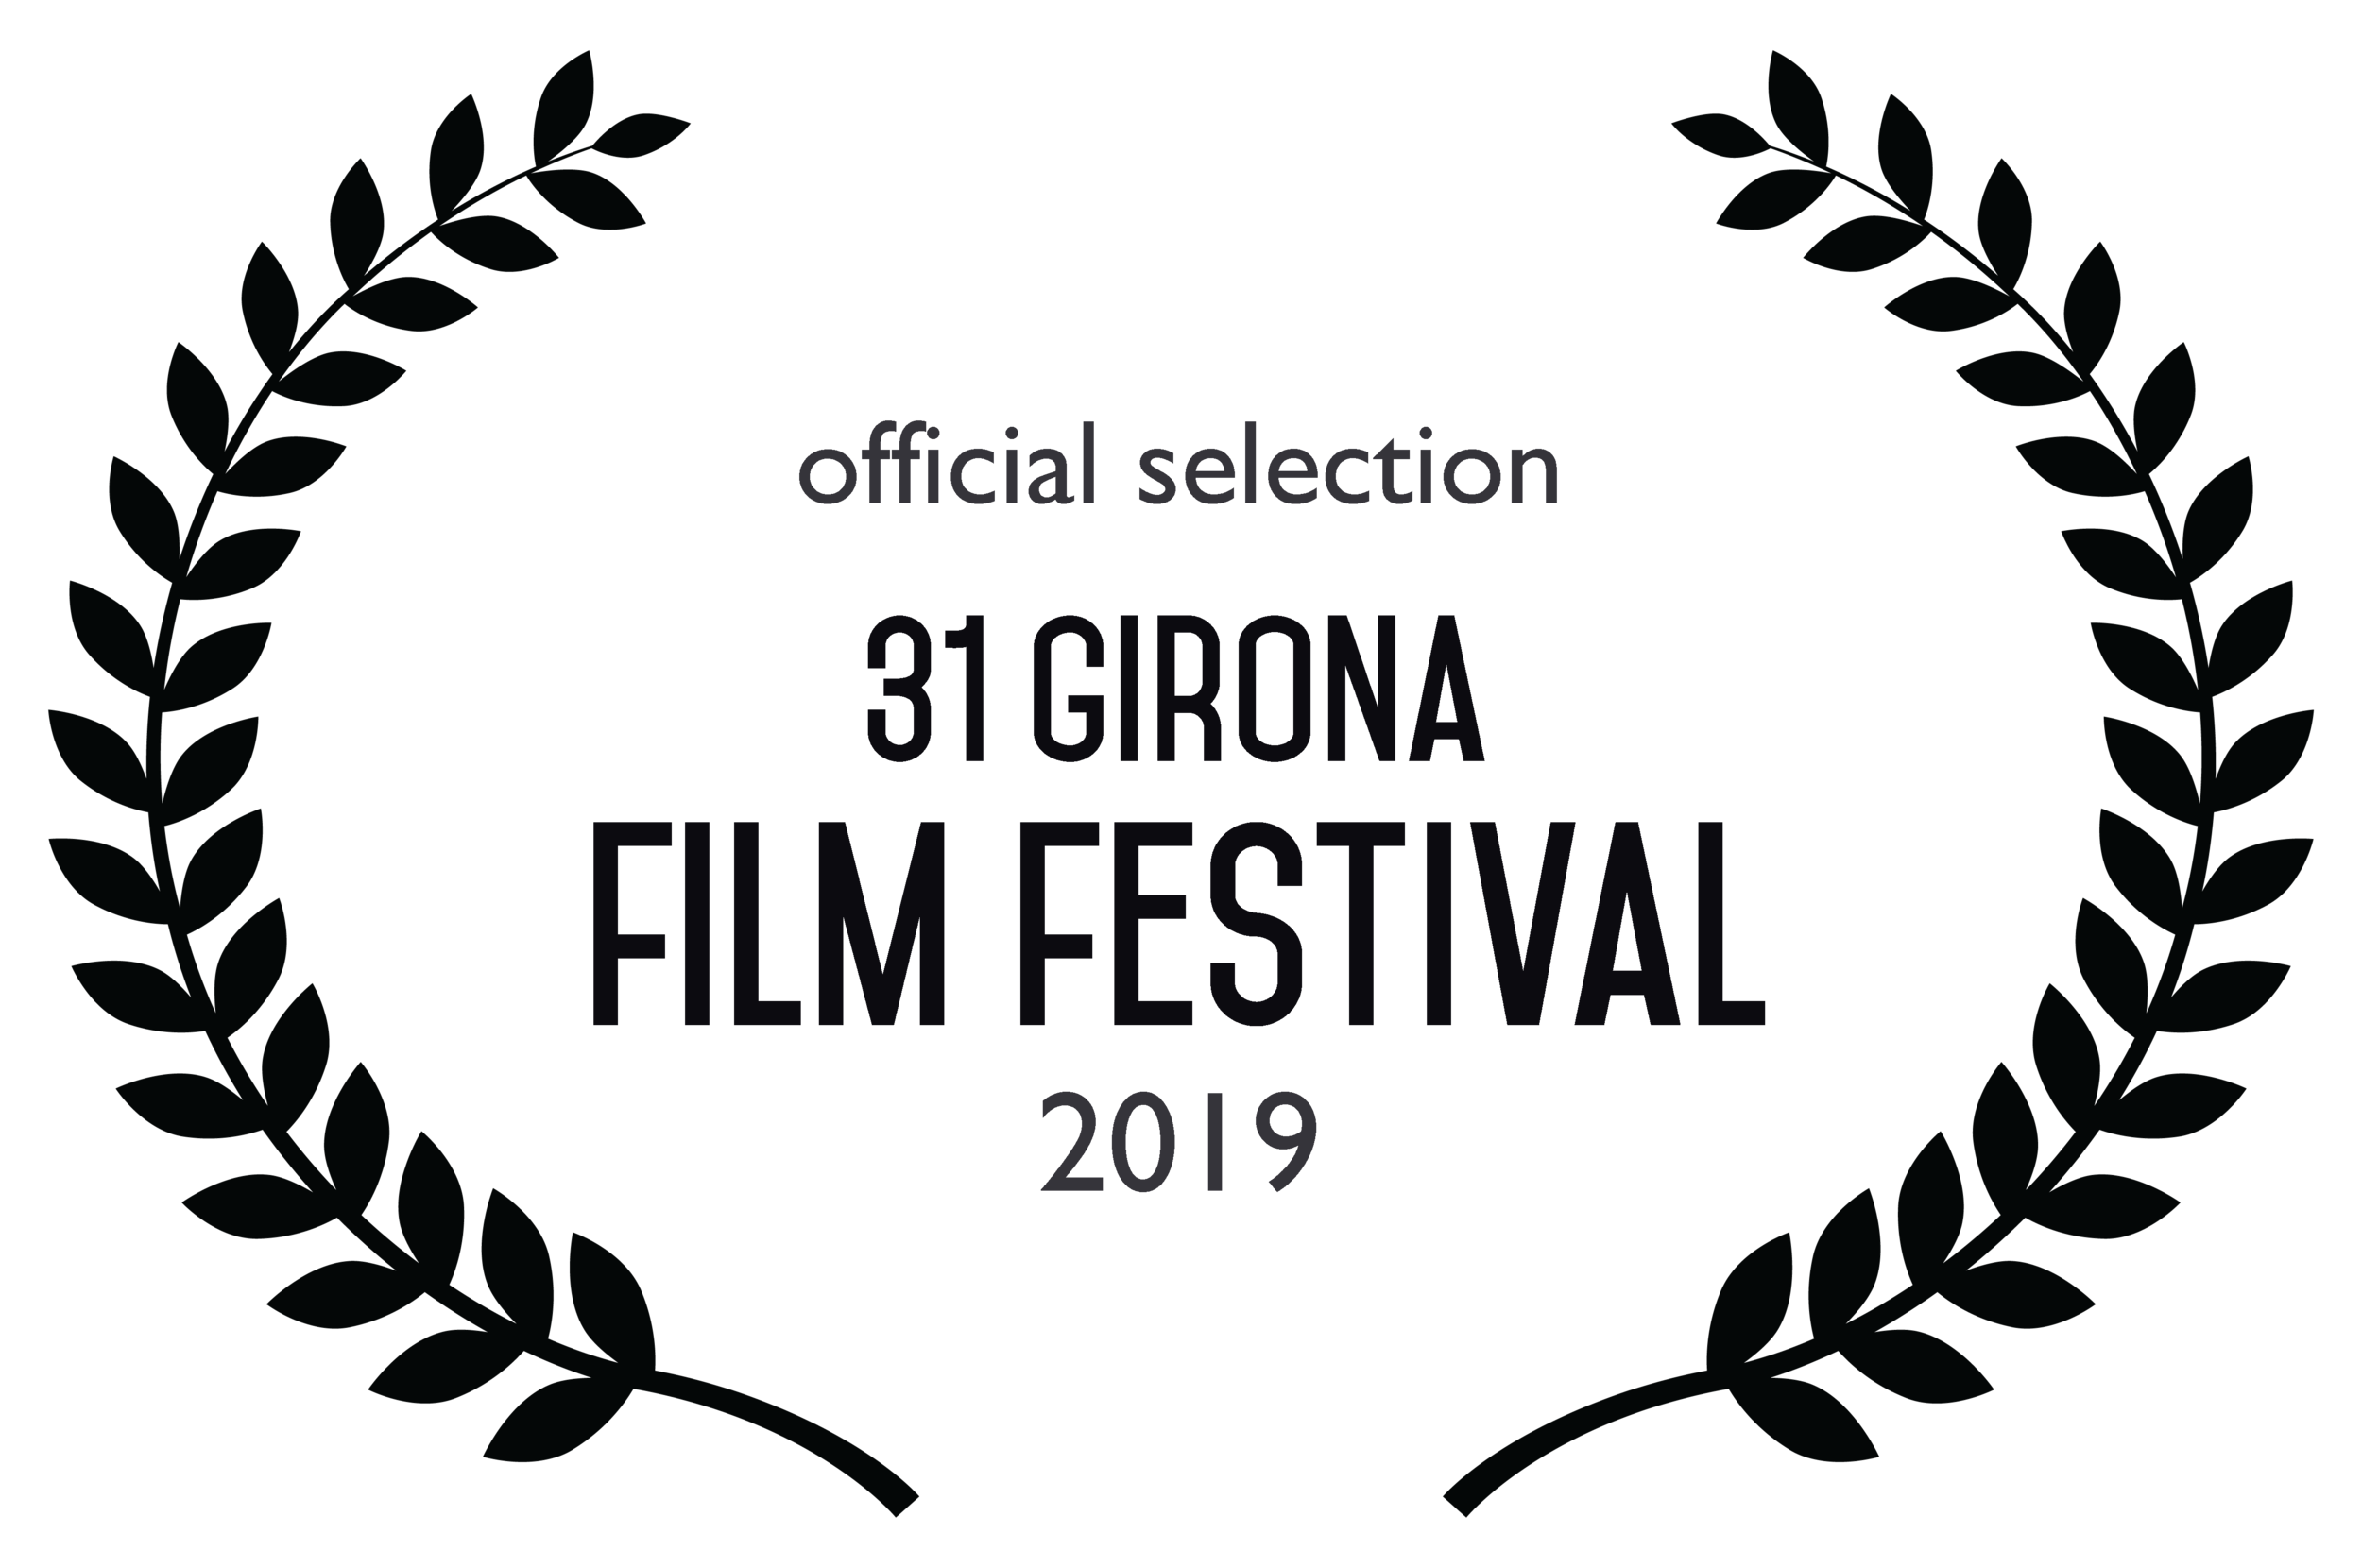 OFFICIALSELECTION-31GIRONAFILMFESTIVAL-2019_black.png